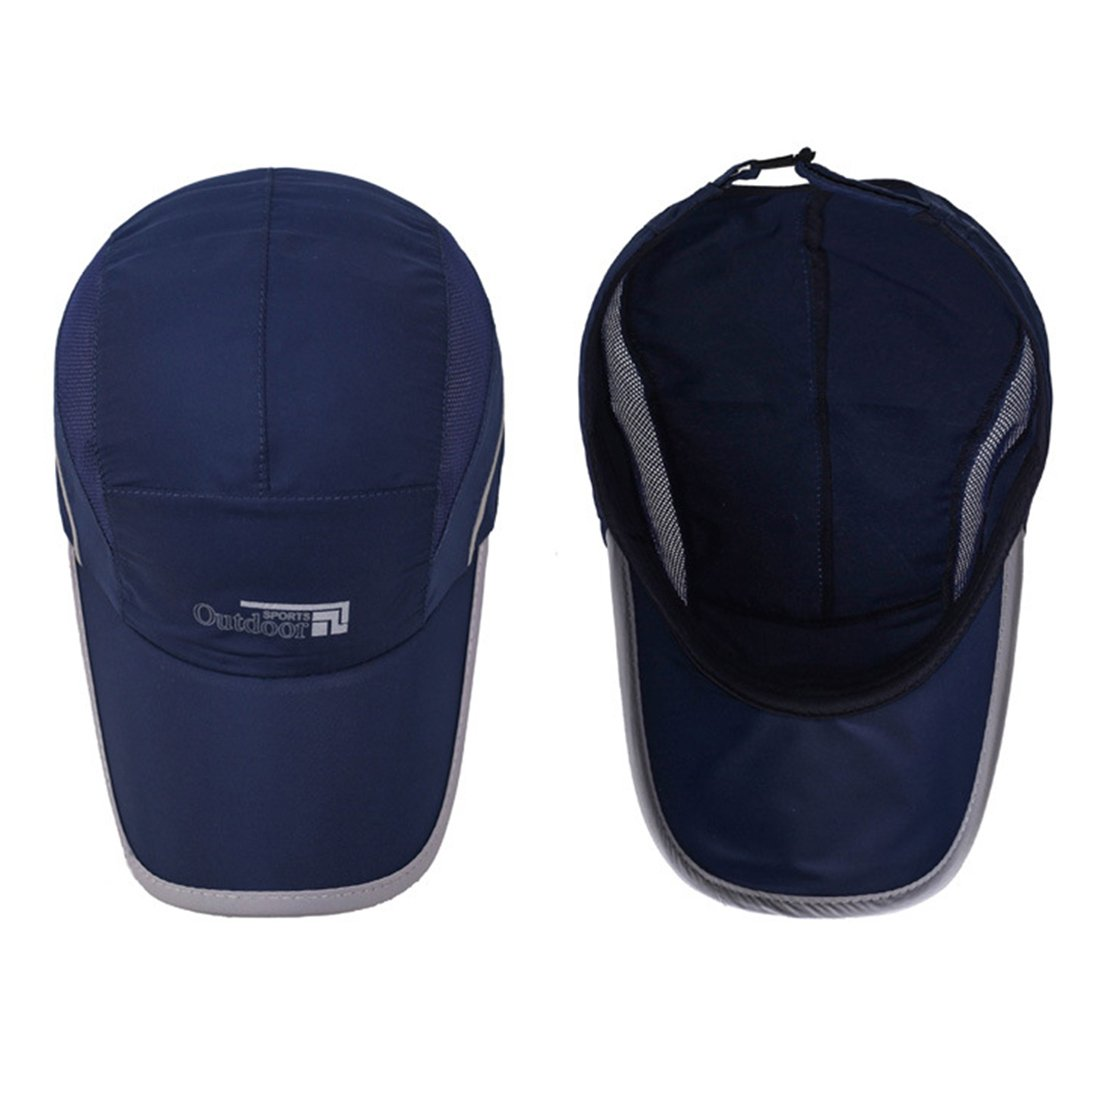 Unisex Adjustable Baseball Cap Summer Mesh Running Hats Sport Cap Outdoor Sport Waterproof Hat Trucker Hat for Hiking Cycling